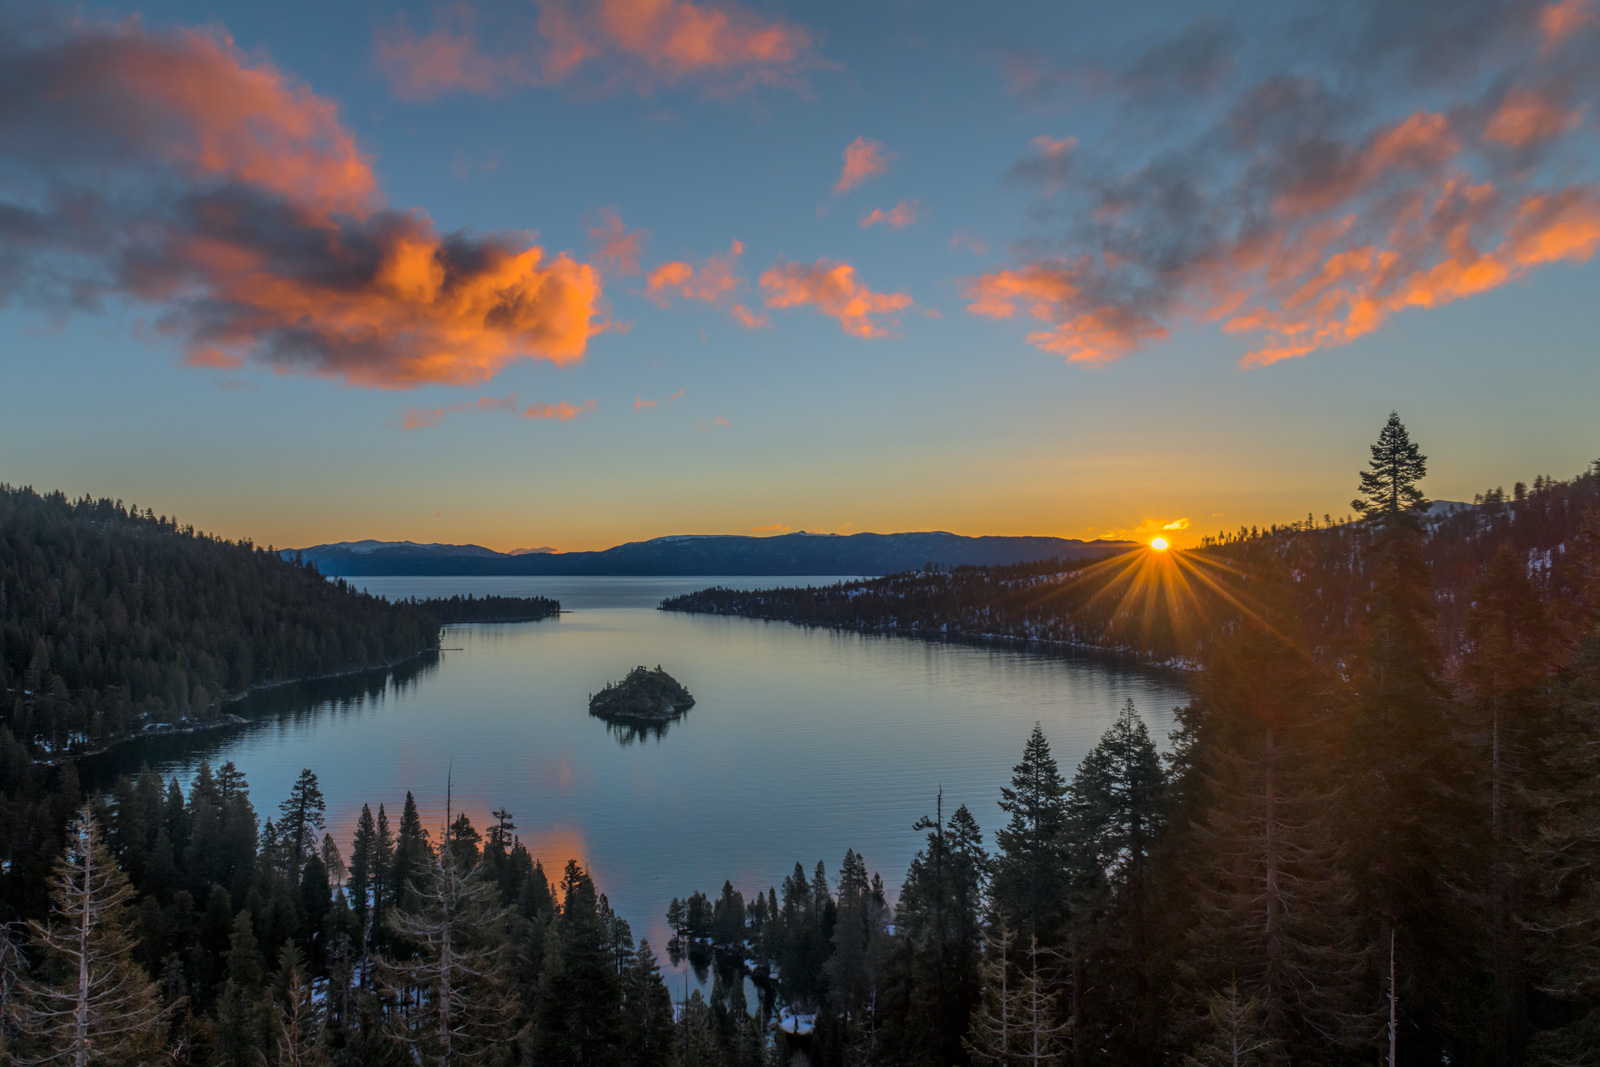 California, Lake, Tahoe, Emerald, Bay, Sunrise, limited edition, photograph, photo